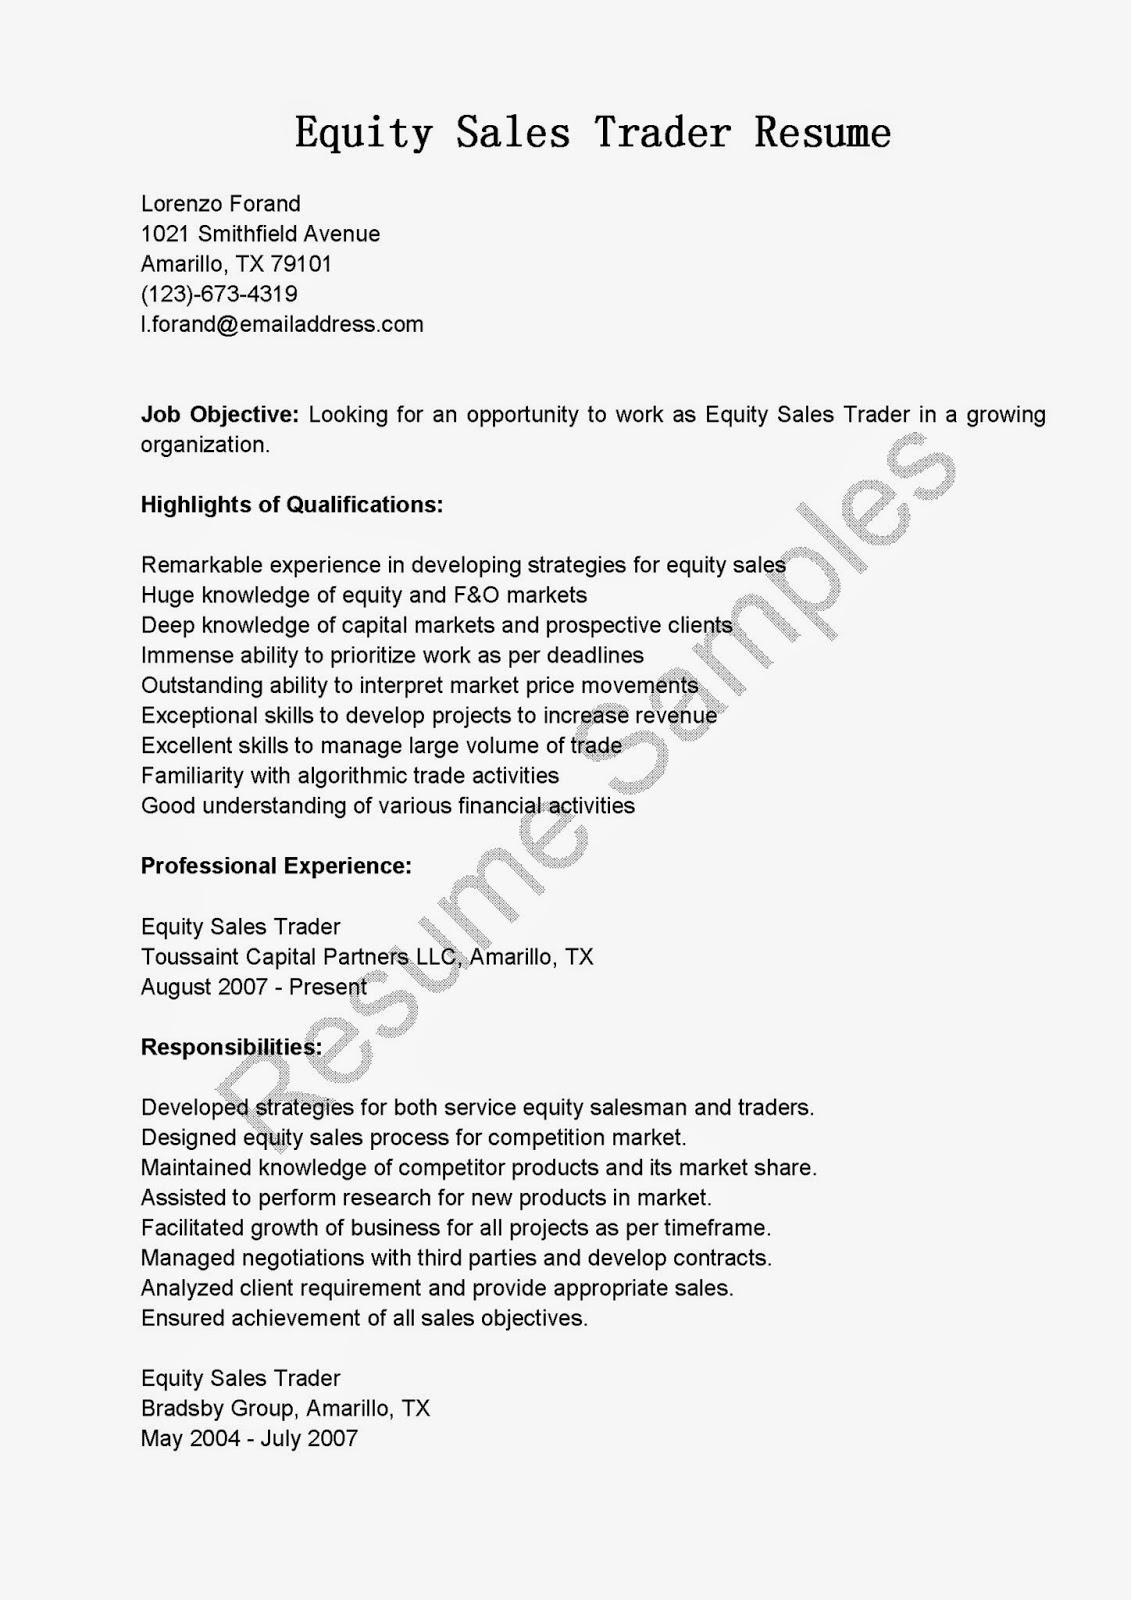 equity trader resume - Jasonkellyphoto.co